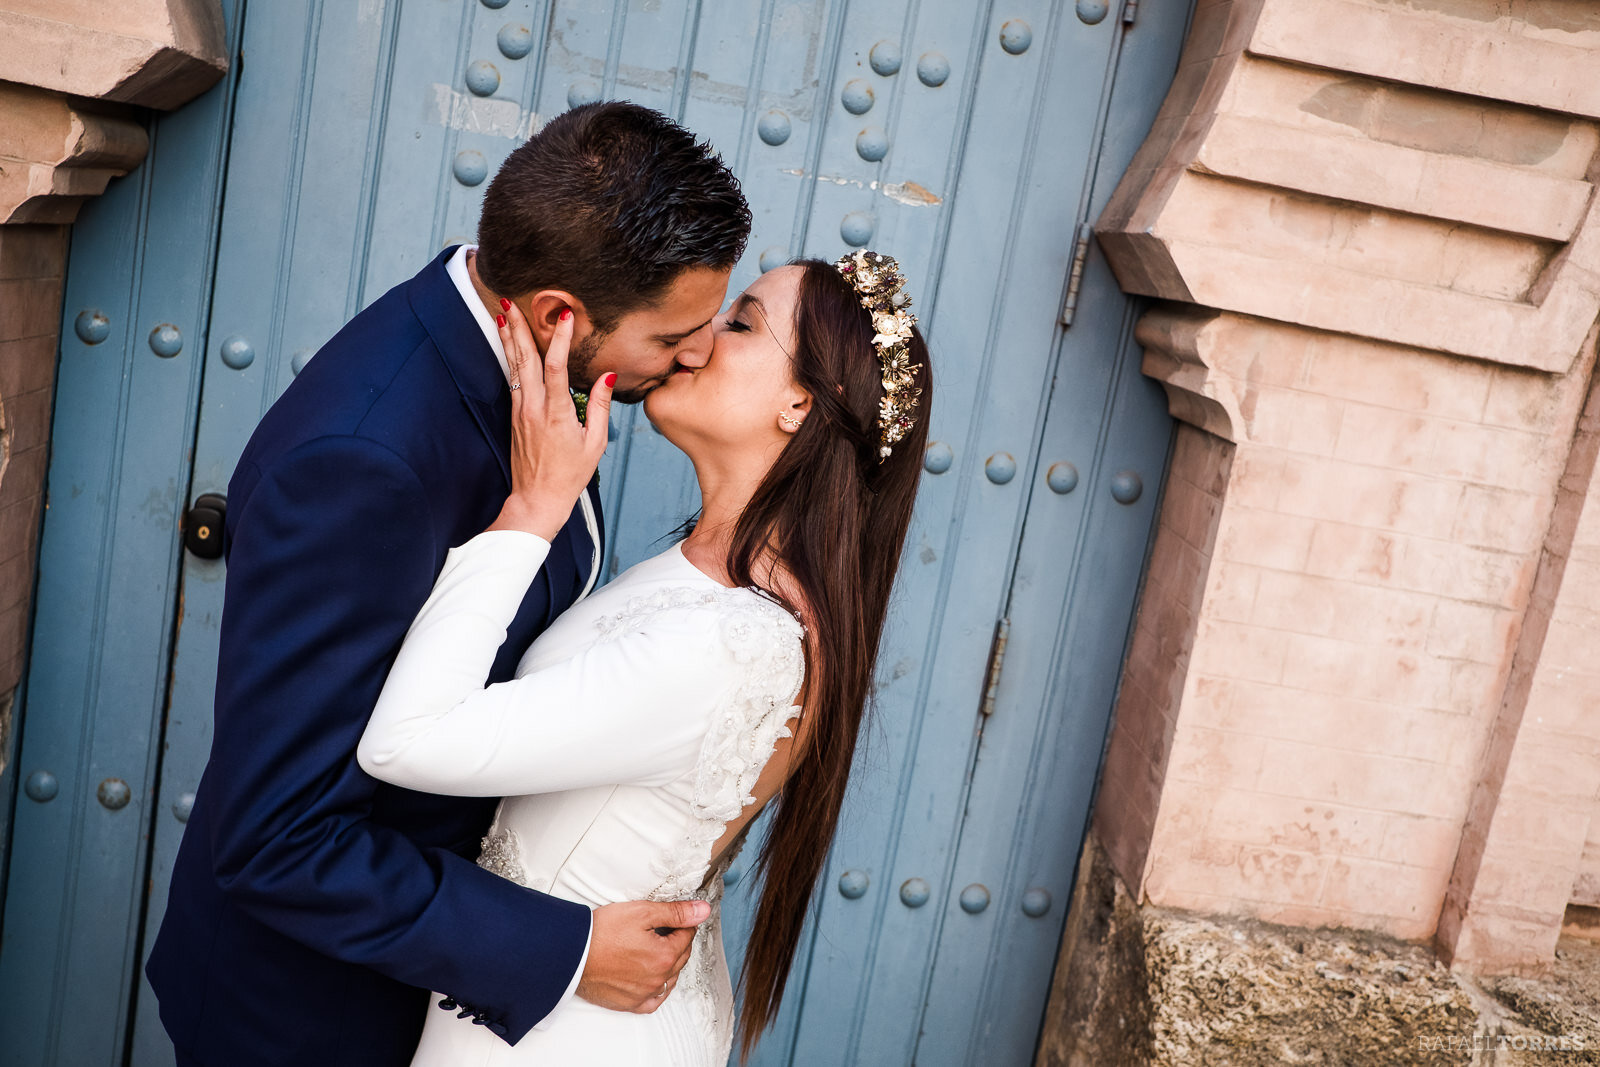 postboda-cadiz-fotografo-boda-diferente-wedding-10.jpg